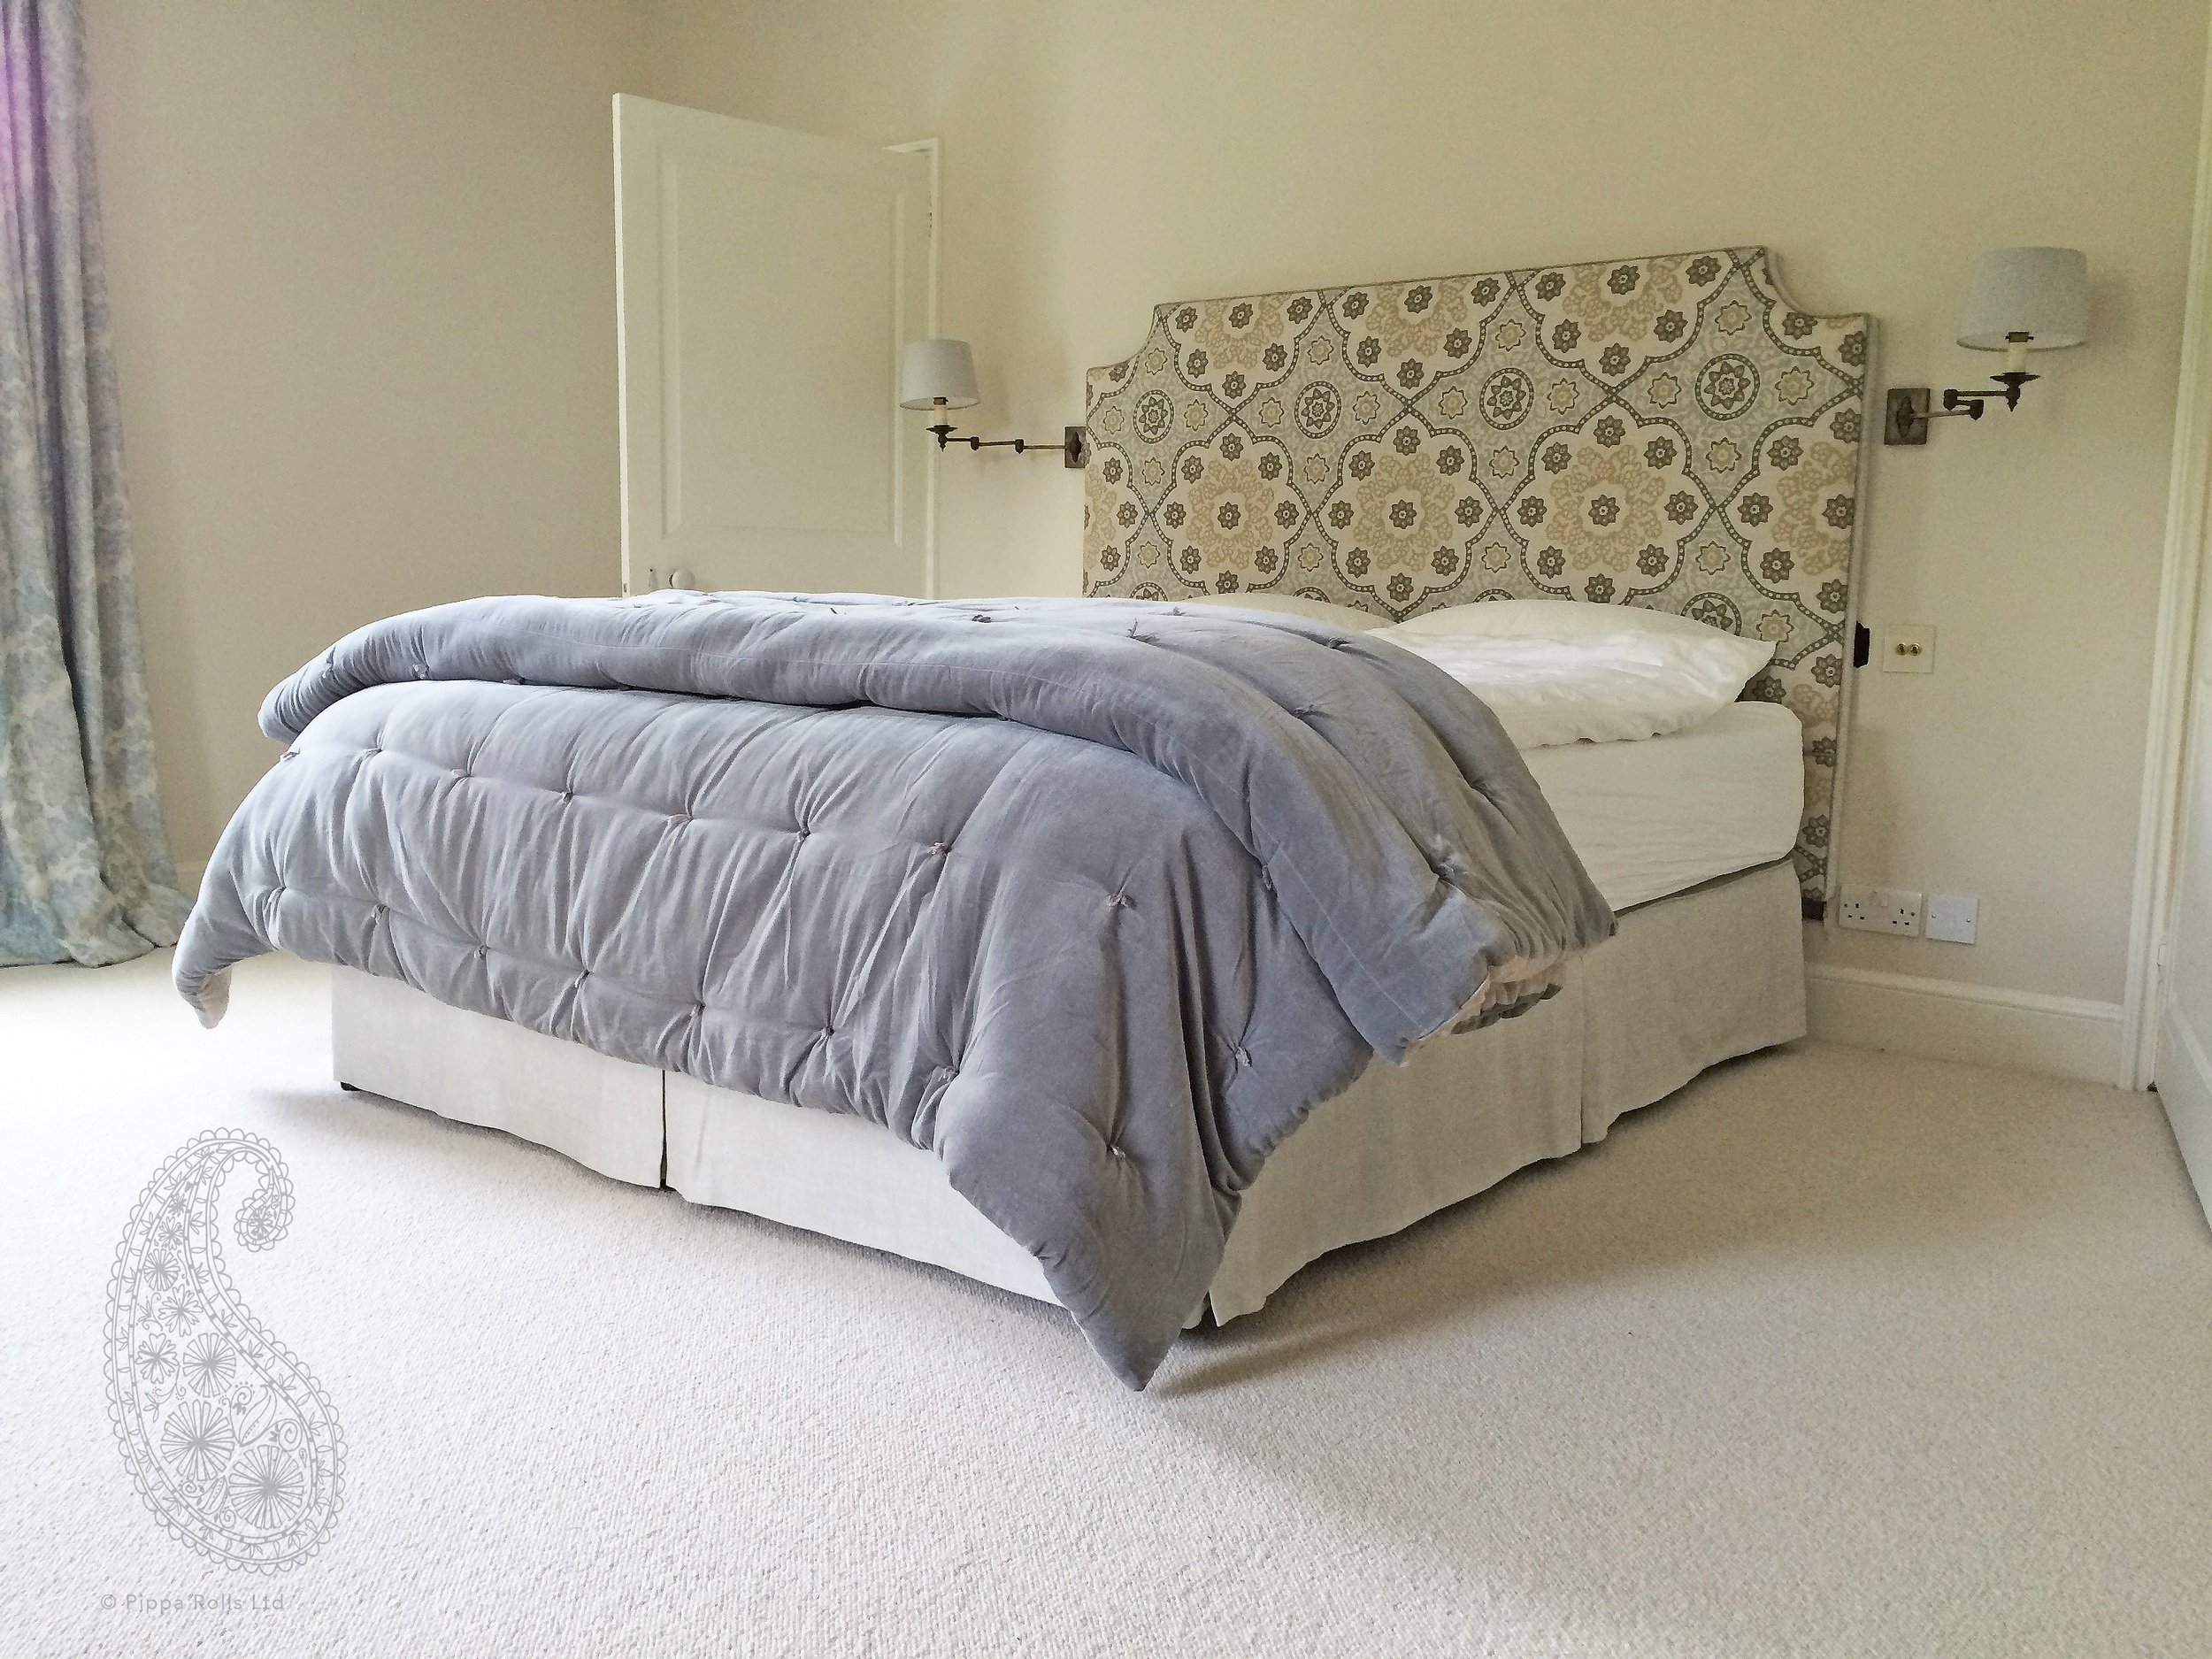 Kingsize bed valance Pippa Rolls Limited jpeg.jpg